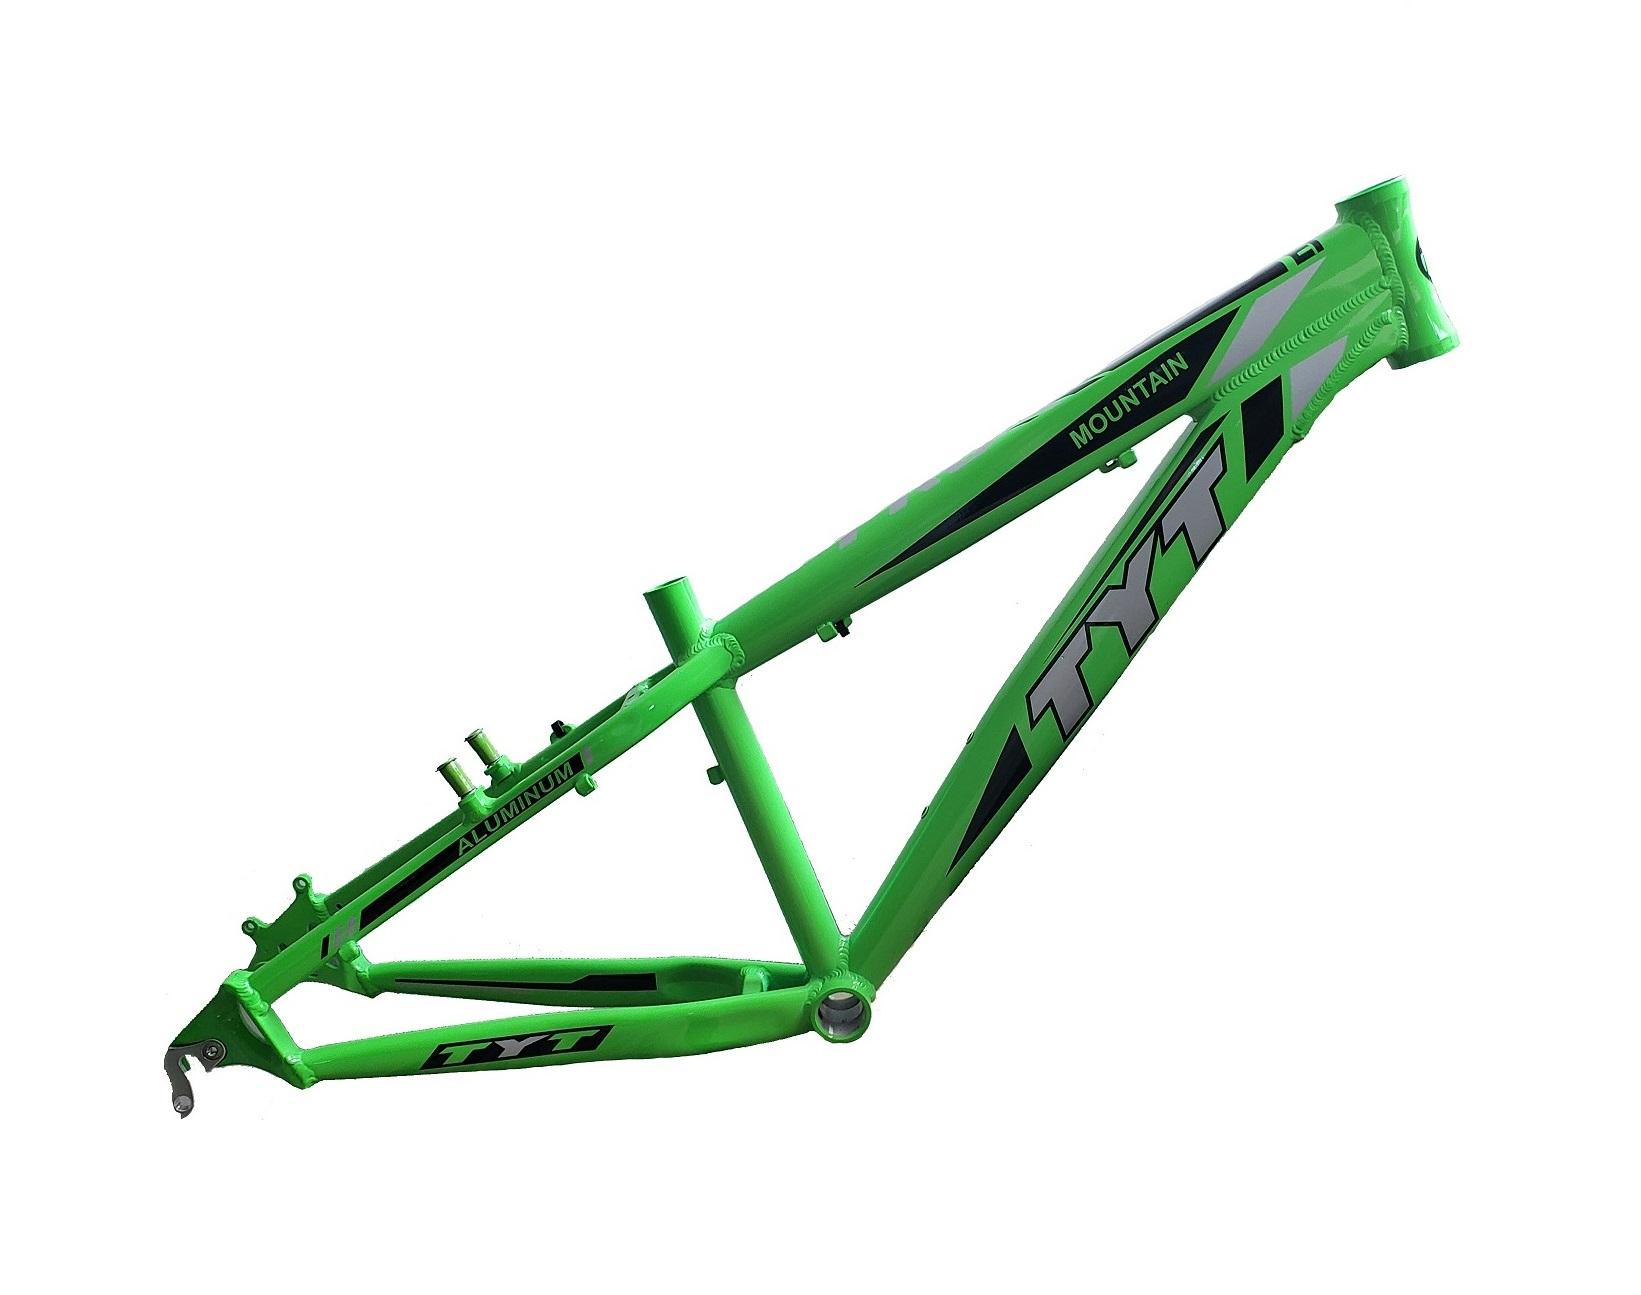 Quadro TYT Freeride Aro 26 Dh Freestyle Passeio - Verde